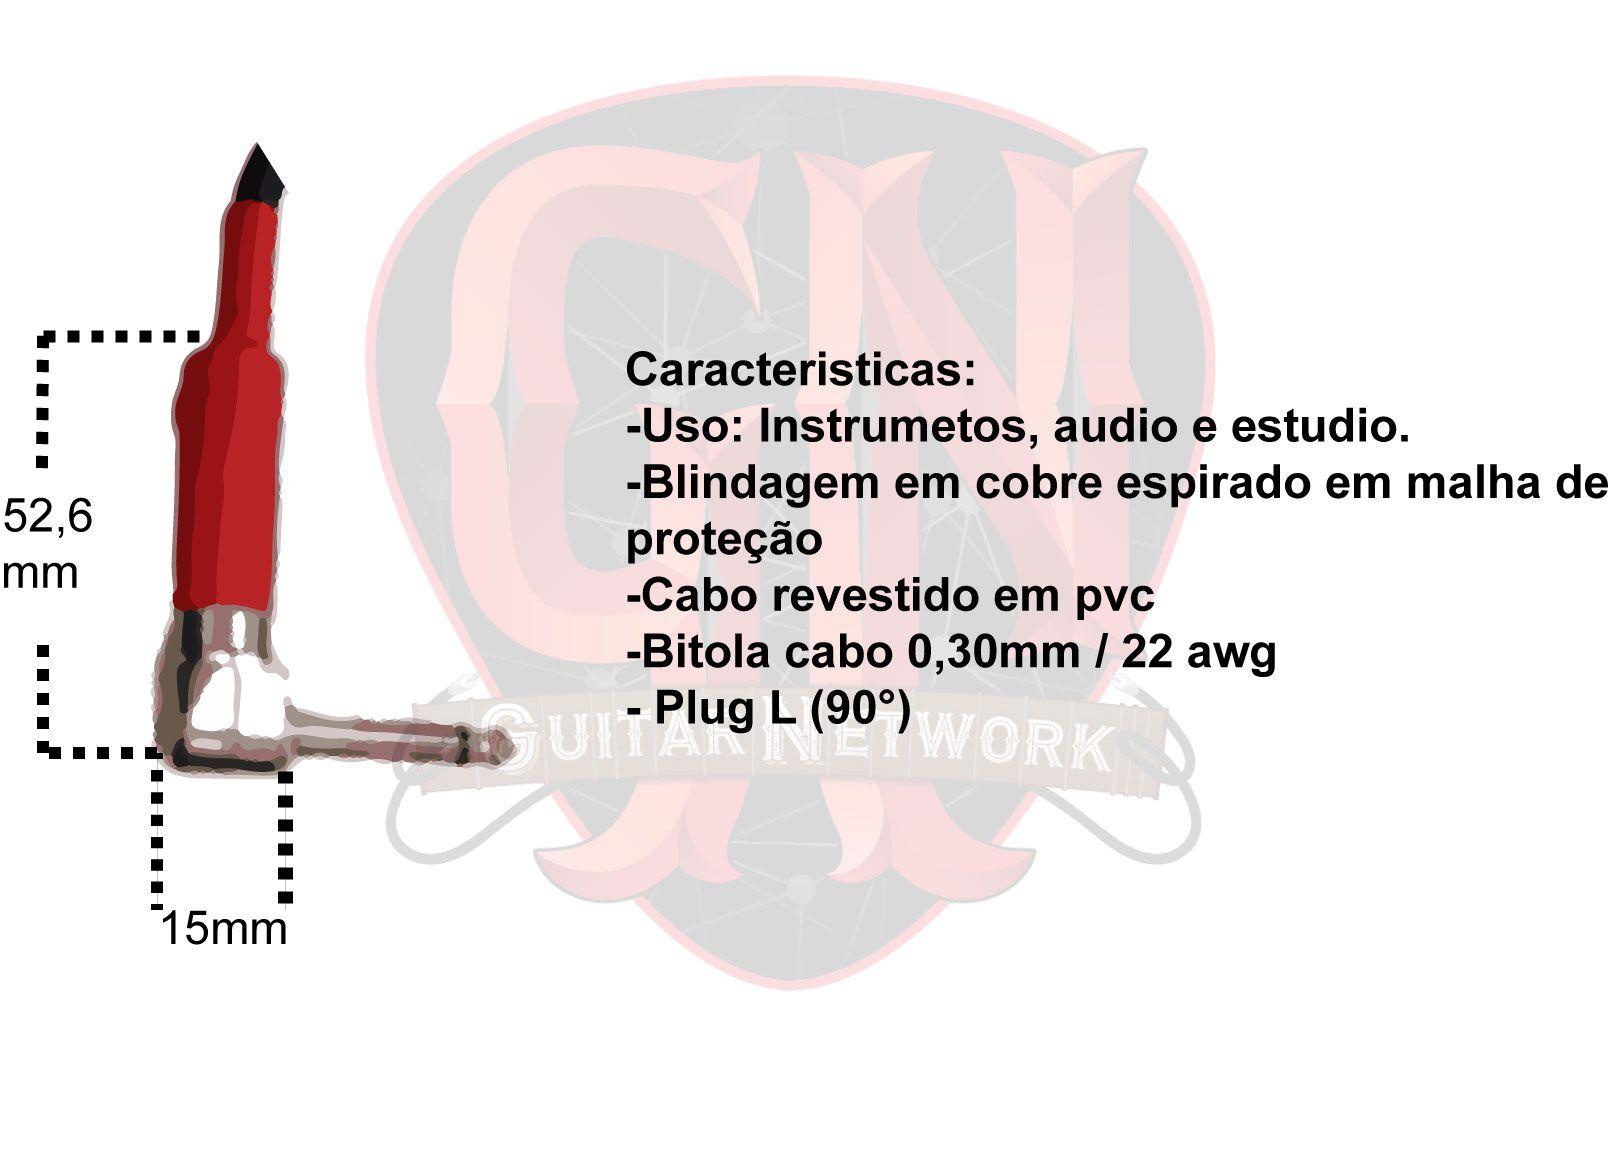 CABO P/ PEDAL PEDALBOARD GUITARRA P10 X P10  20 CM  BC015 - BRIXTON